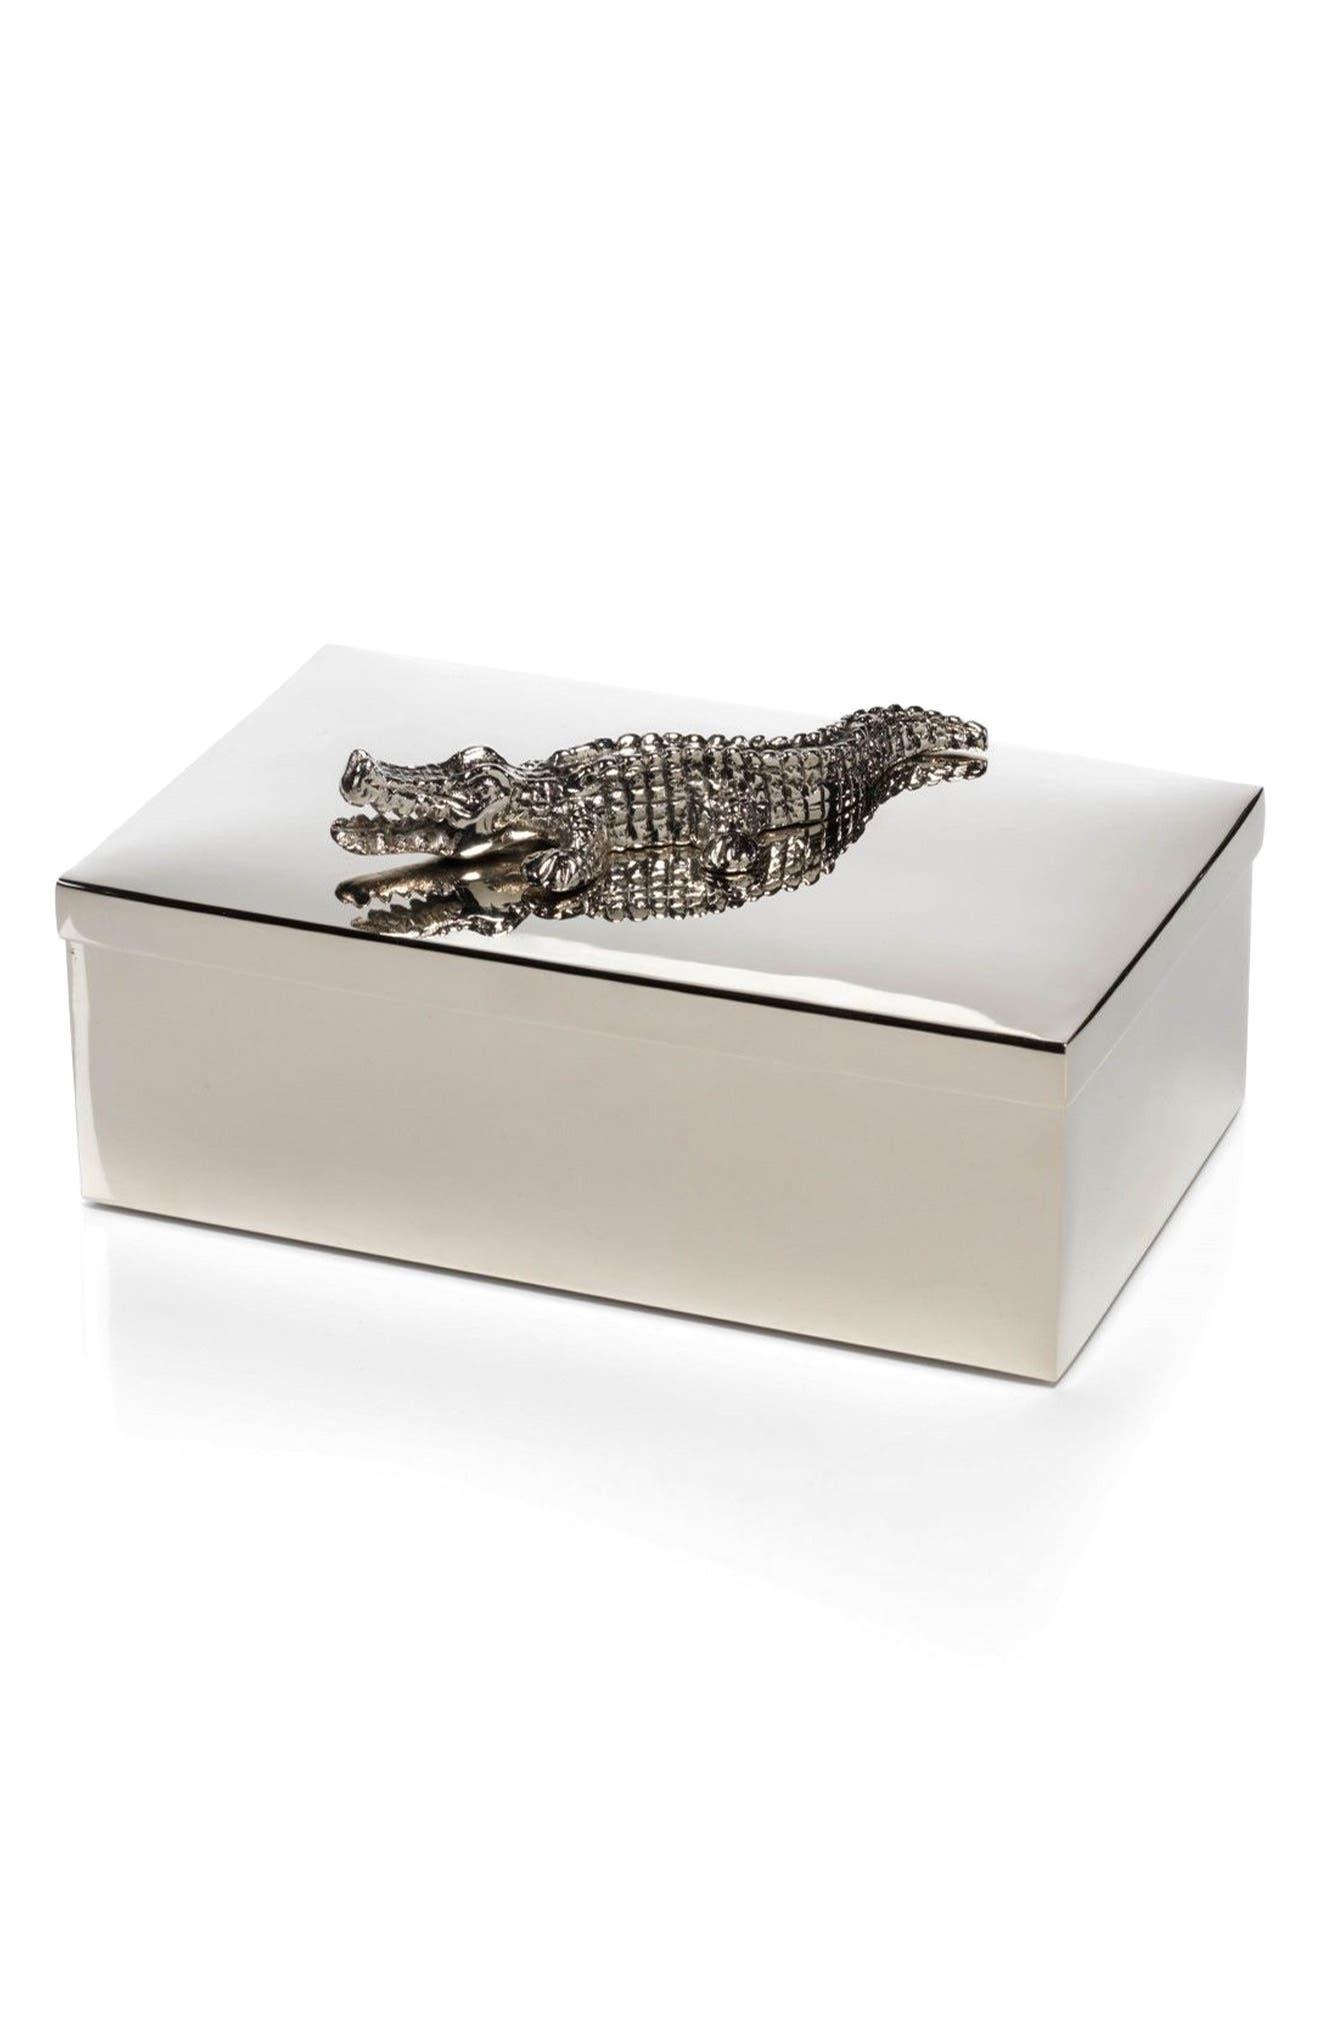 Alternate Image 1 Selected - Zodax Crocodile Mirrored Jewelry Box